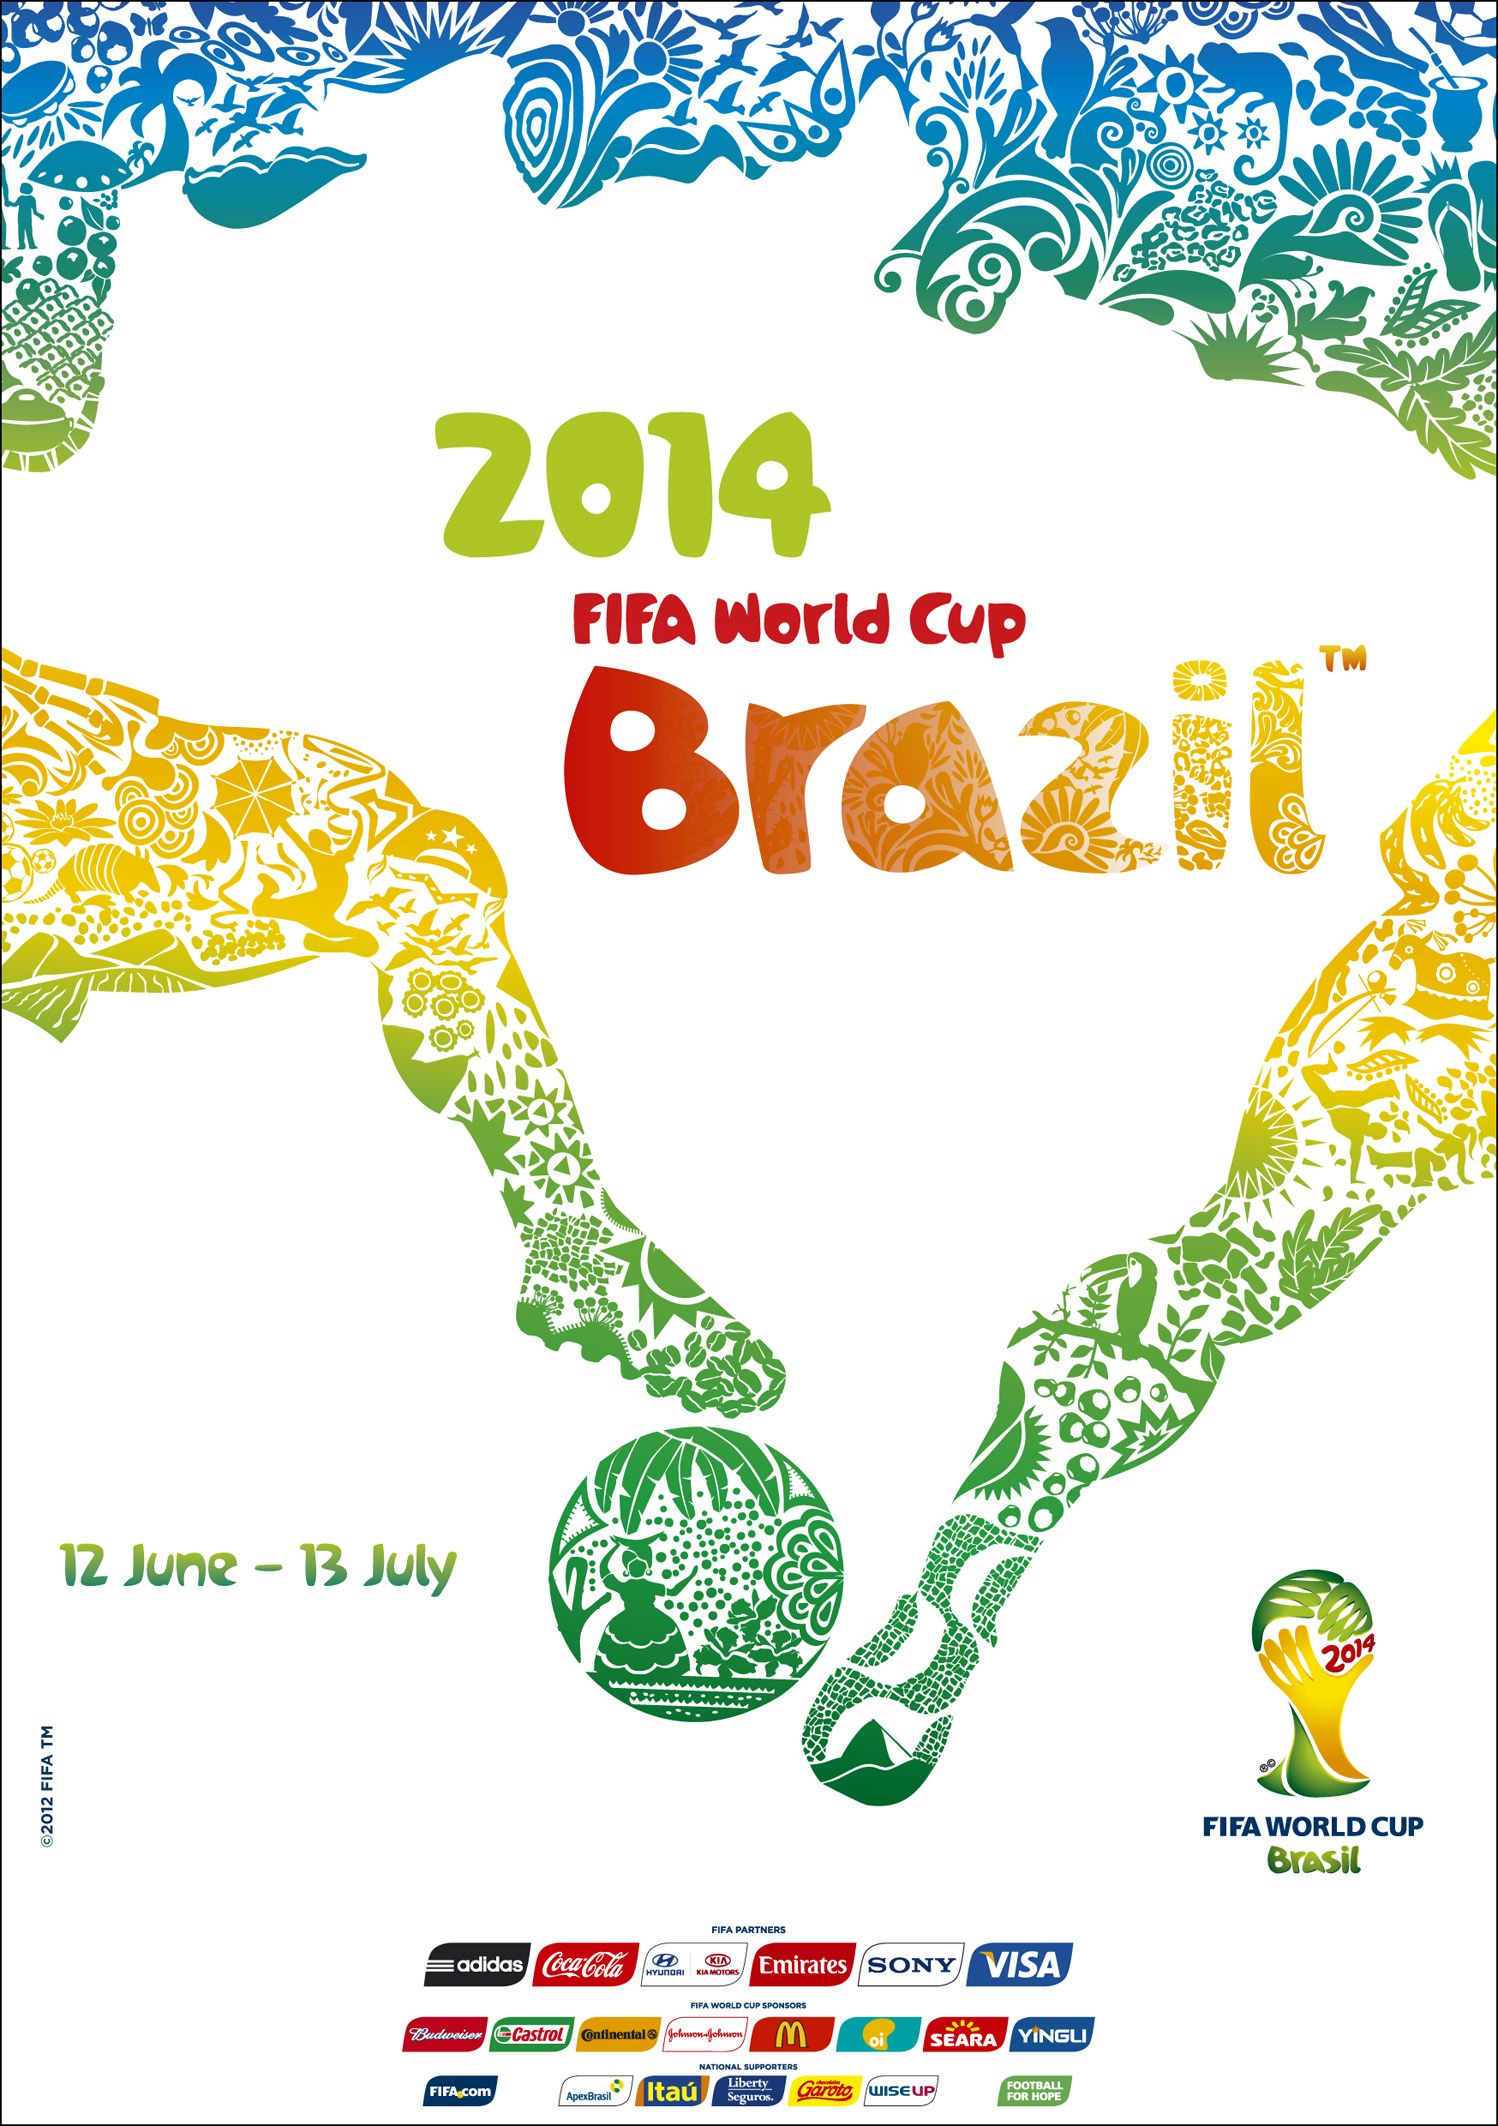 Pin De Zarah Kabir En Qatar Fifa 2022 Poster Creating Inspiration Mundial De Futbol Copa Del Mundo De Futbol Copa Del Mundo 2014